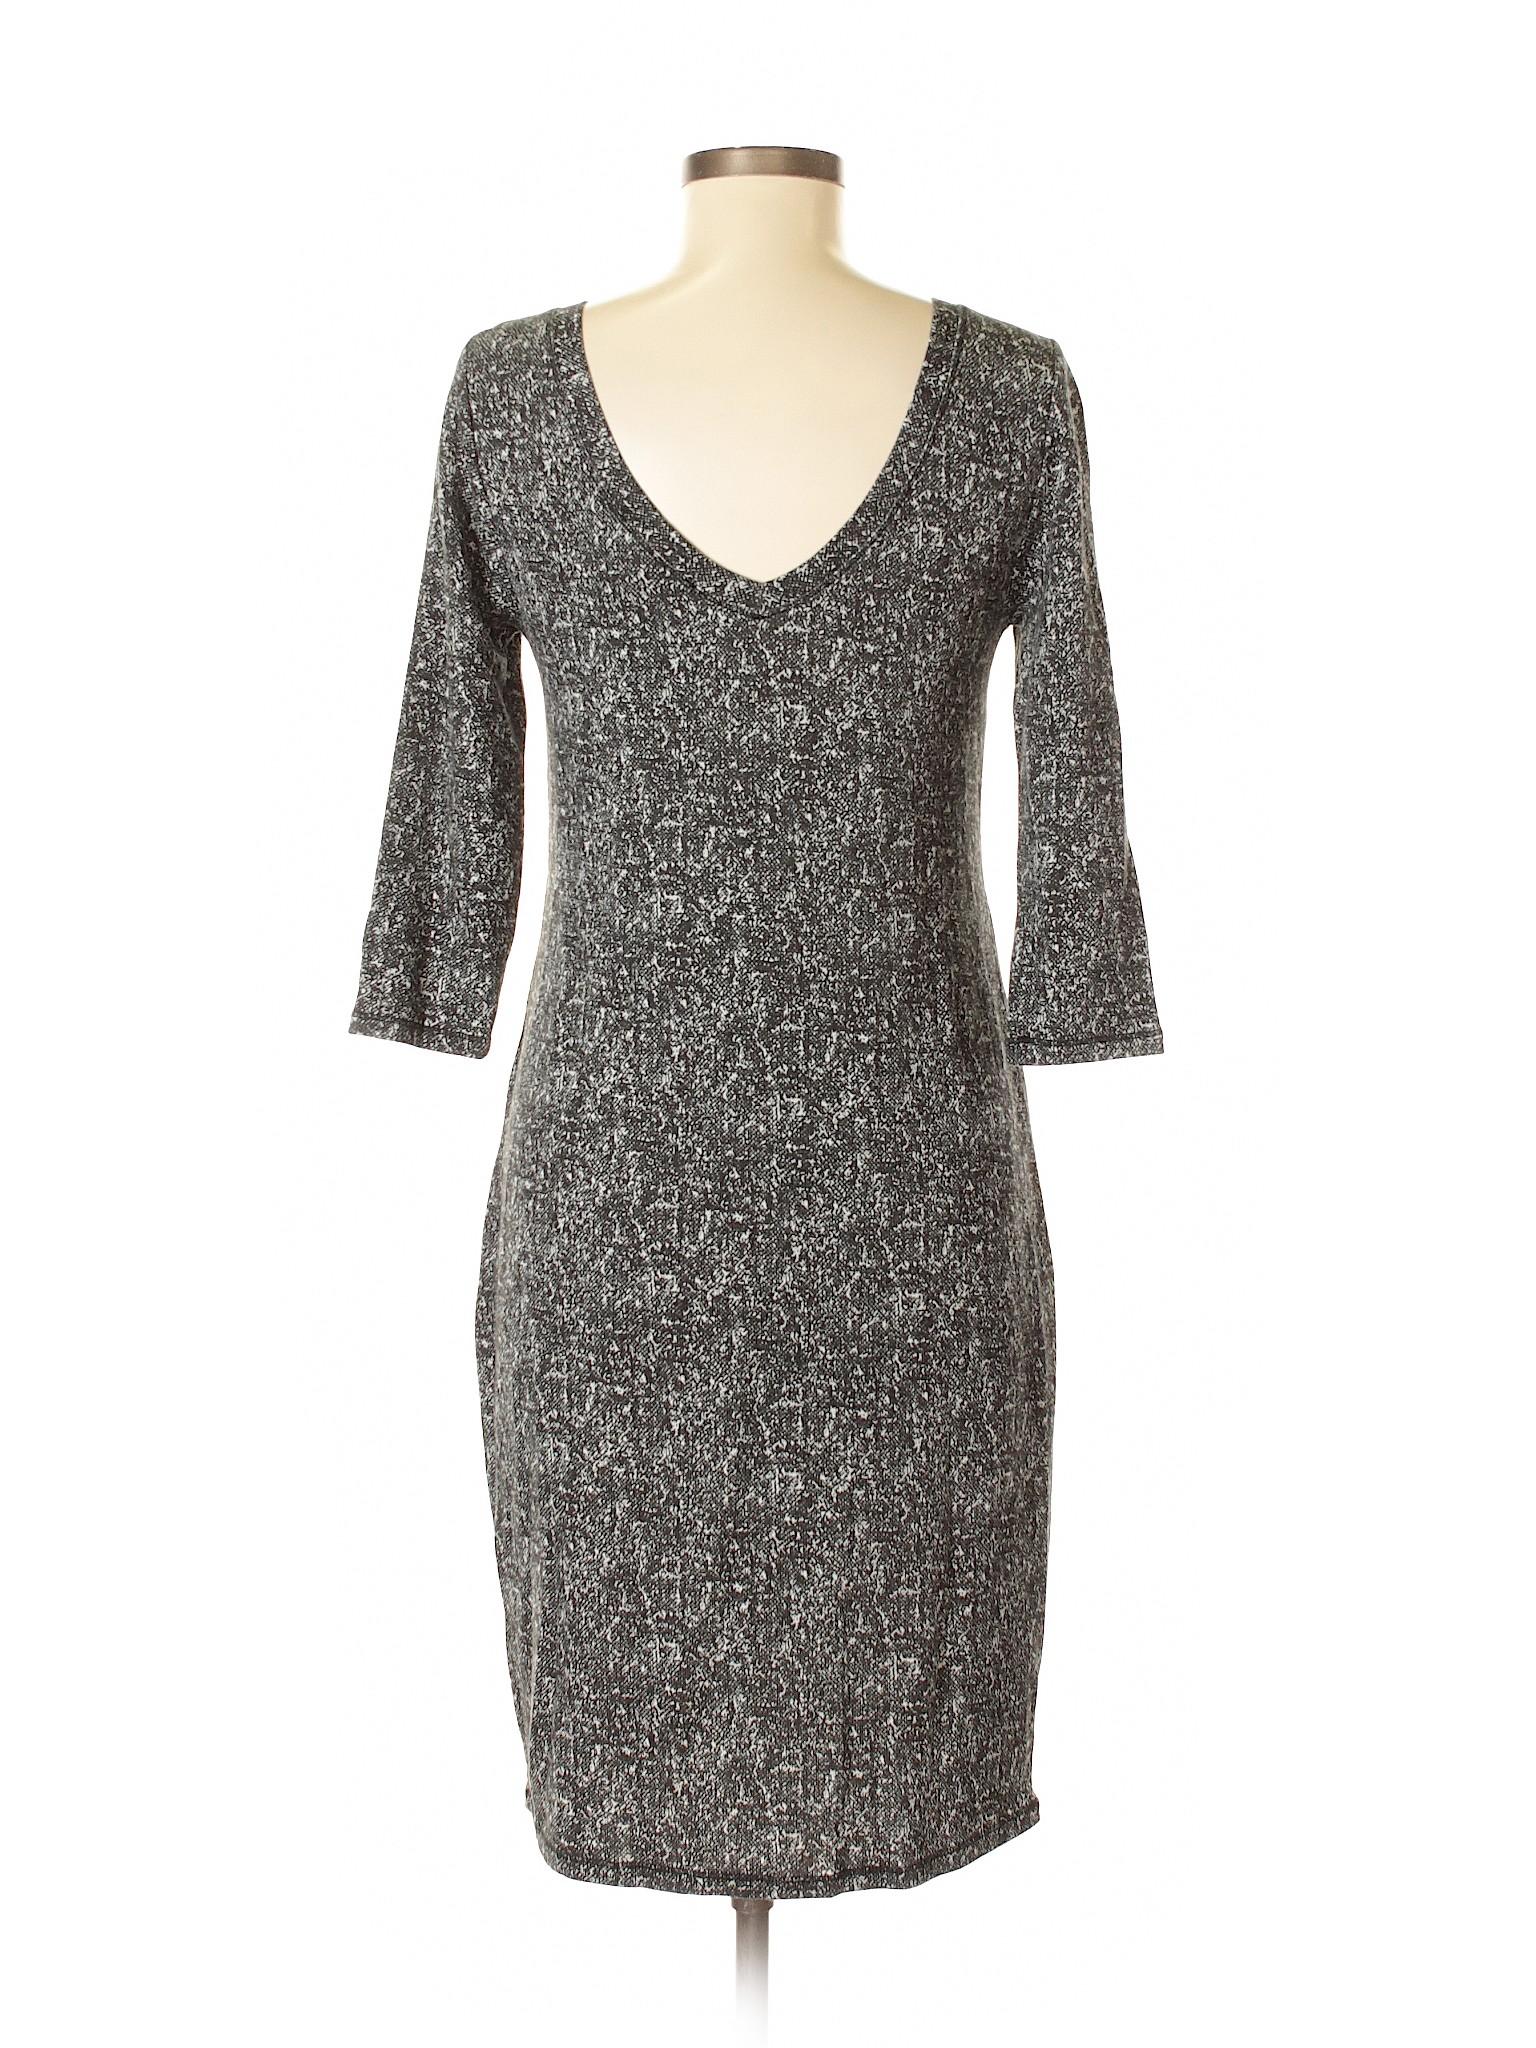 Philosophy Casual Clothing Republic Selling Dress xf4Hd6w